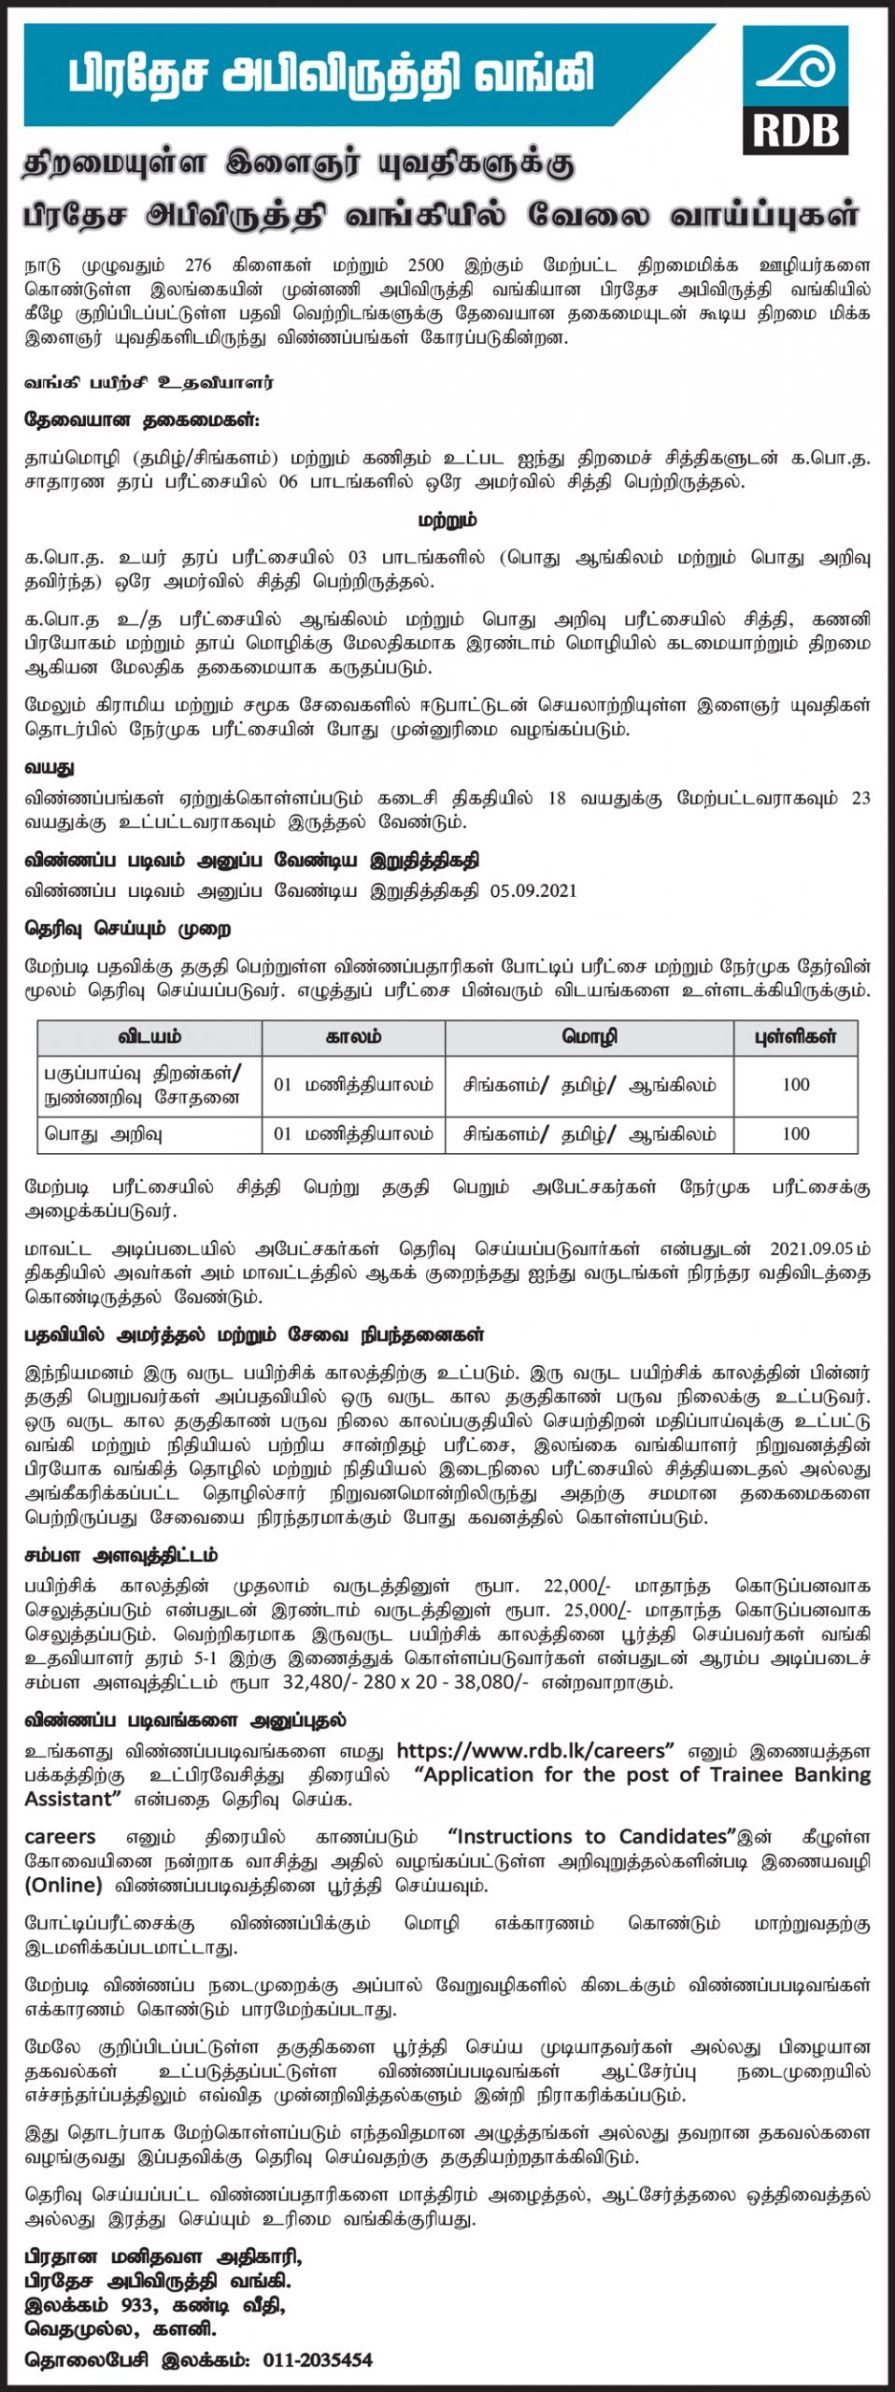 Job Opportunities in Regional Development Bank - (Training Bank Assistant)